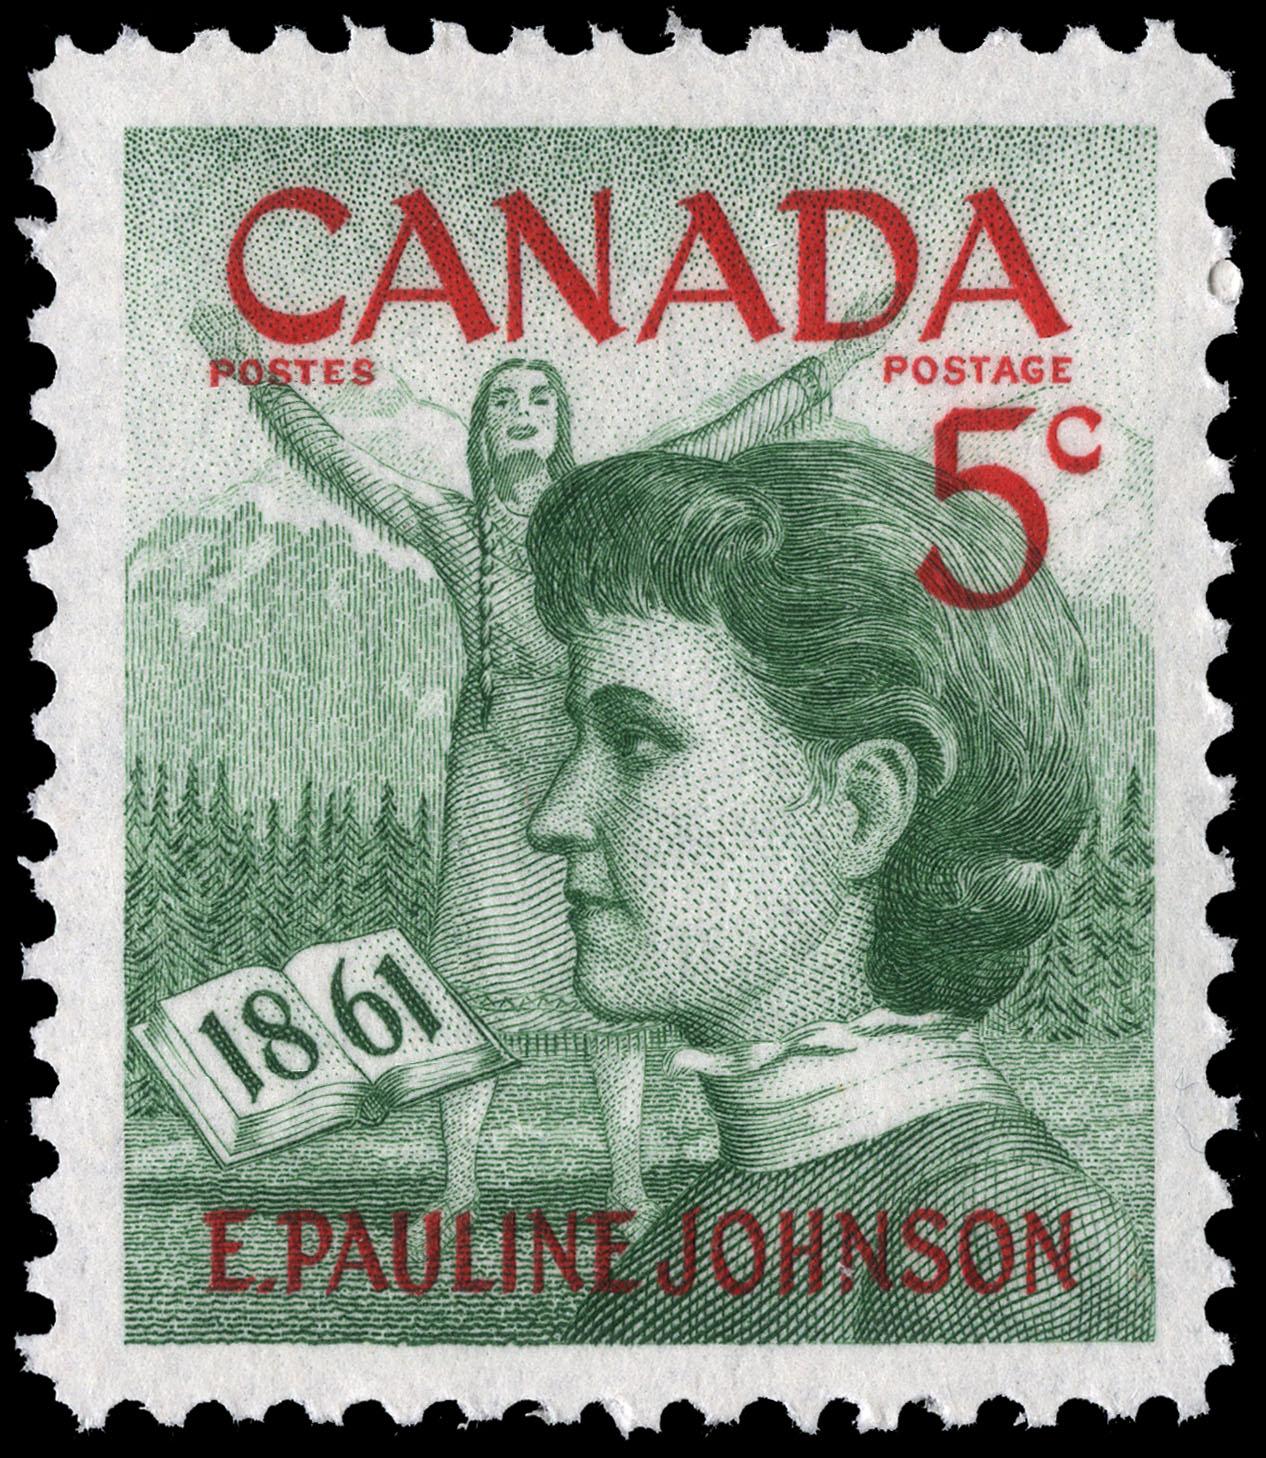 E. Pauline Johnson, 1861 Canada Postage Stamp